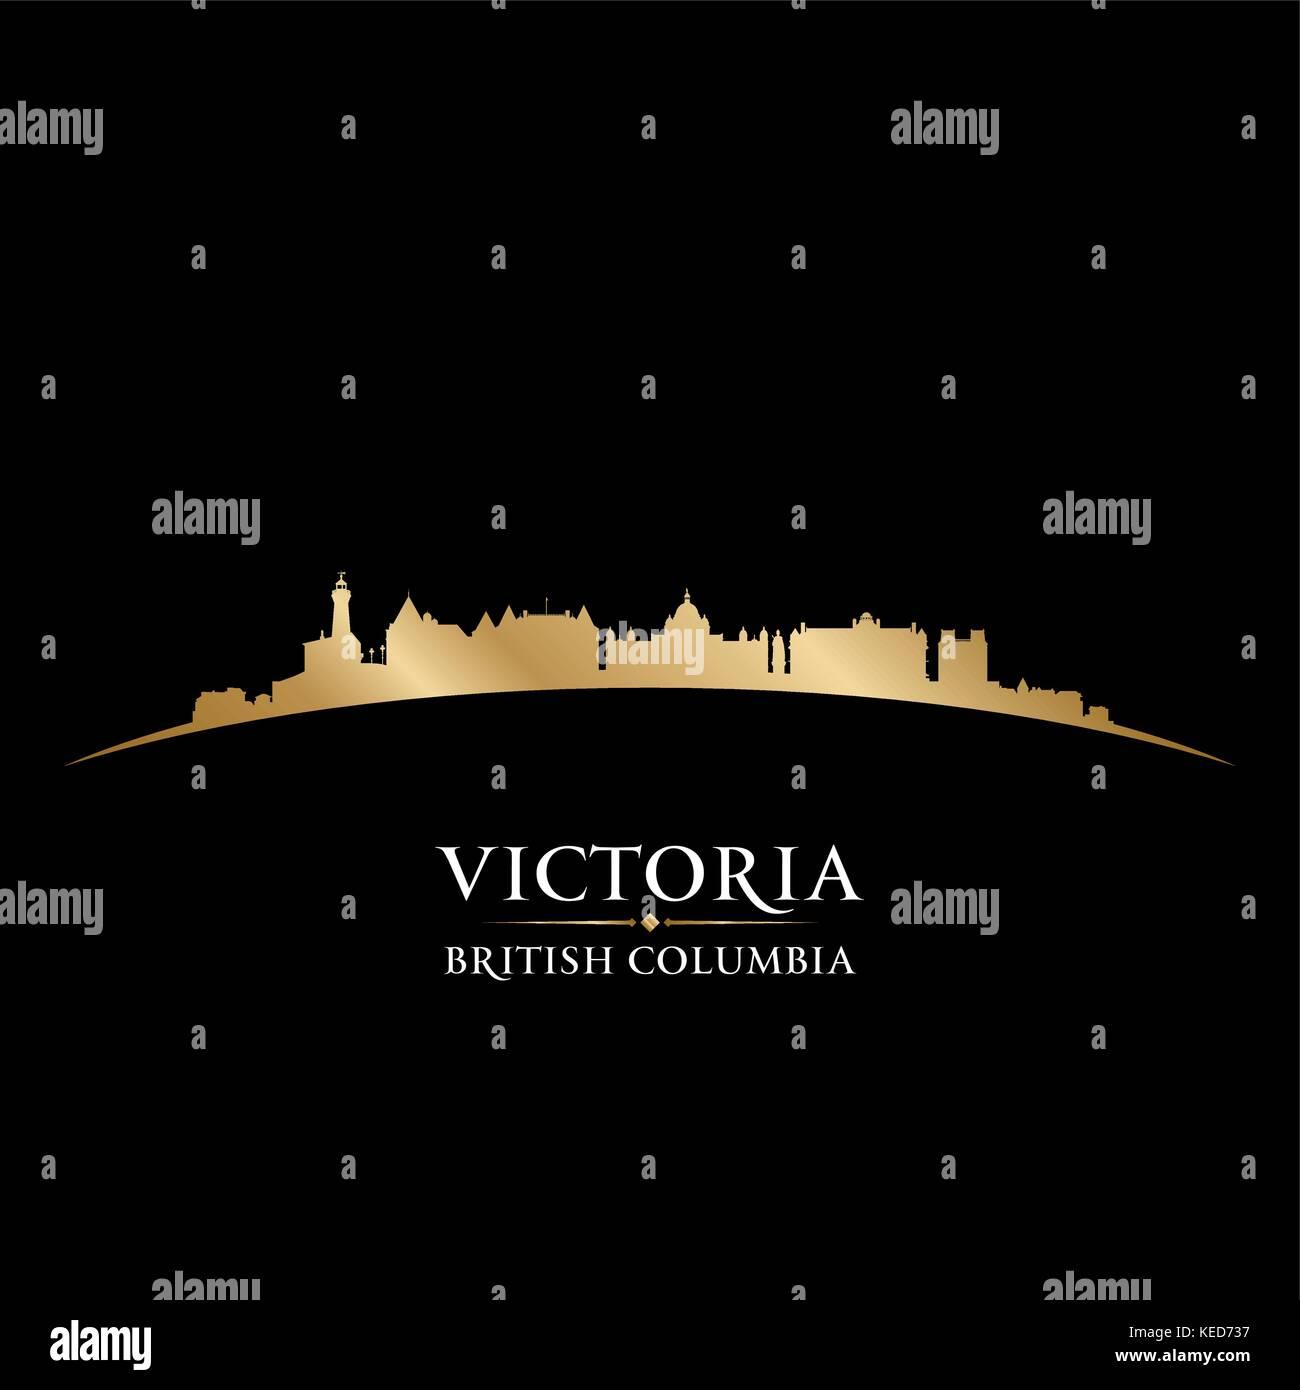 Victoria British Columbia Canada city skyline silhouette. Vector illustration Photo Stock